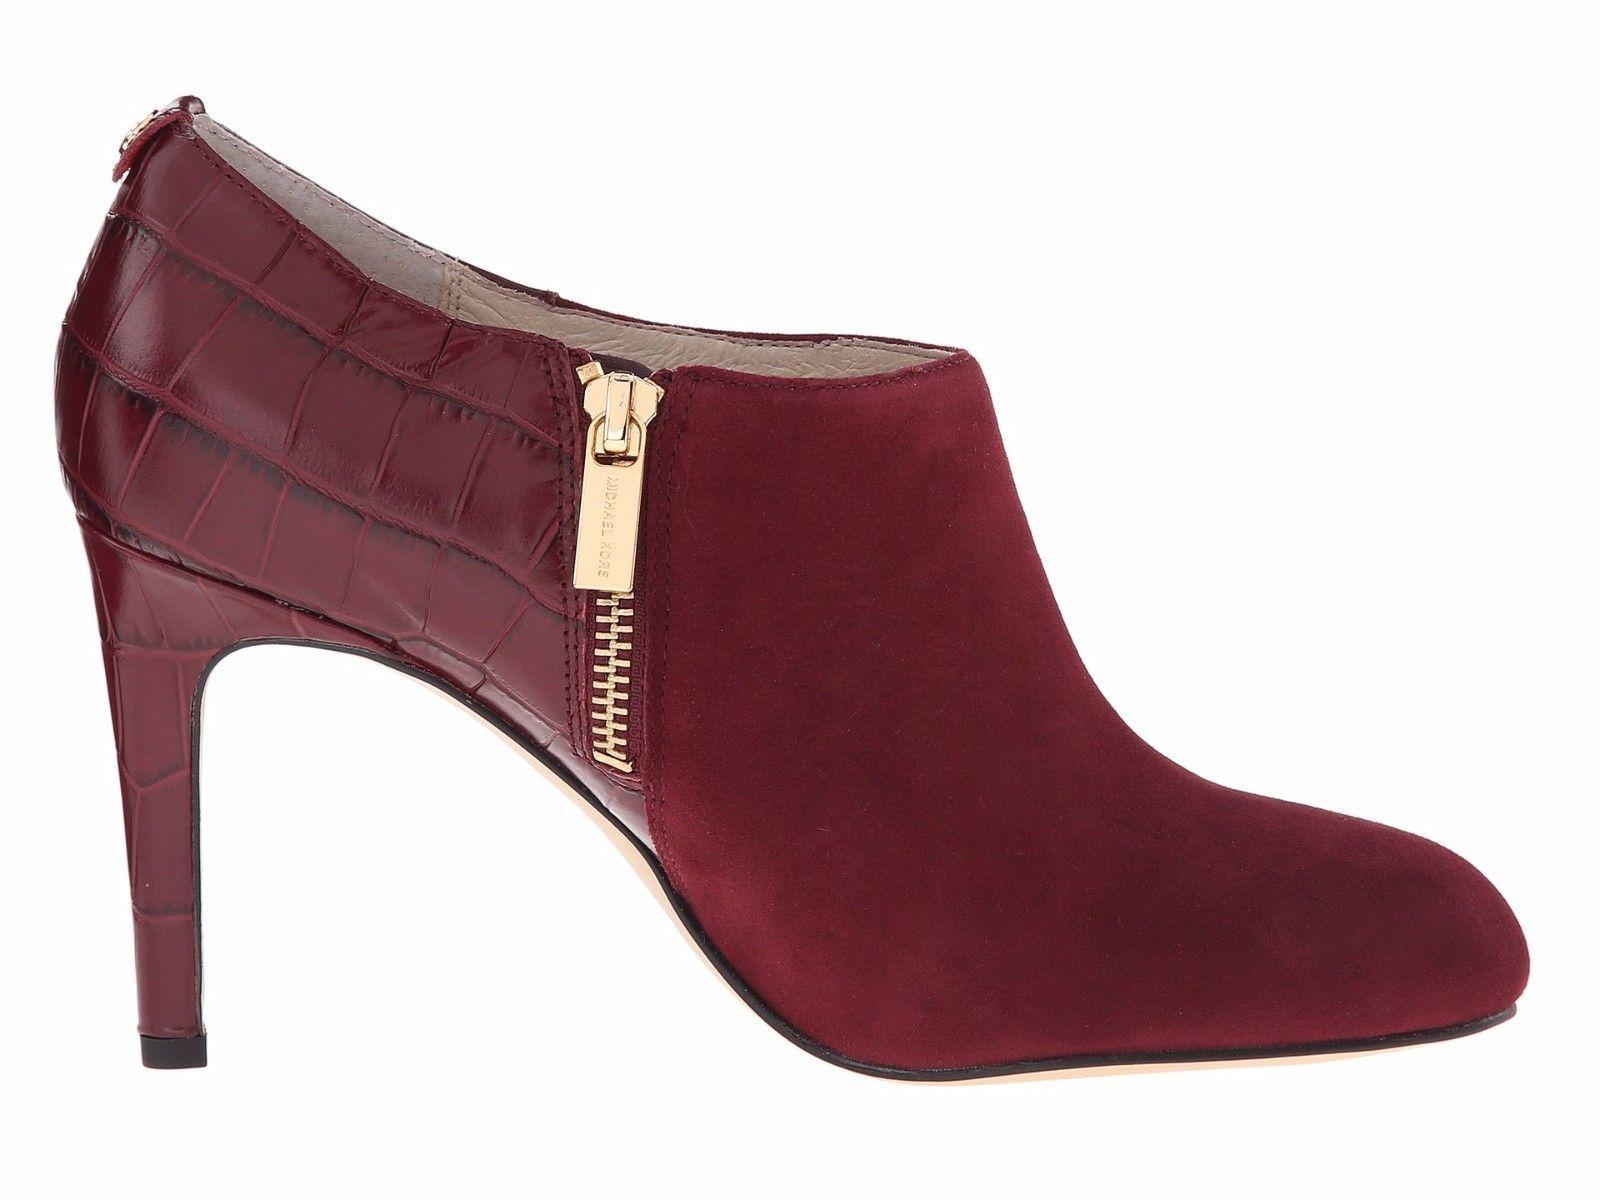 MICHAEL Michael Kors Sammy Ankle Bootie Merlot $175.00 Multiple Sizes